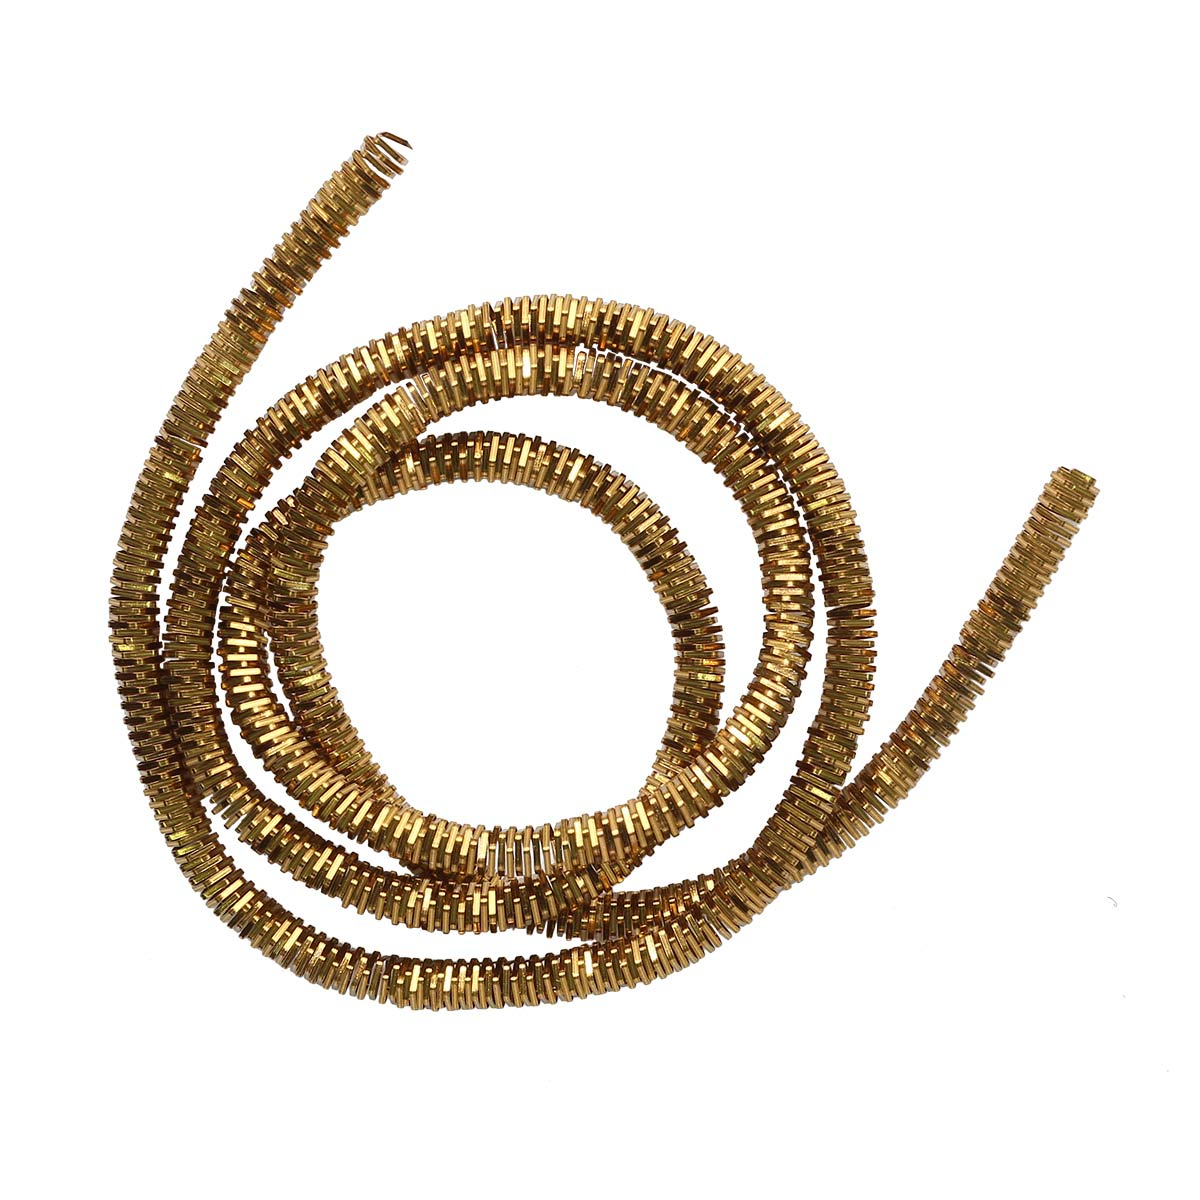 ТК011НН3 Трунцал медный,бронзовый 3,0 мм, 5 гр/упак Астра